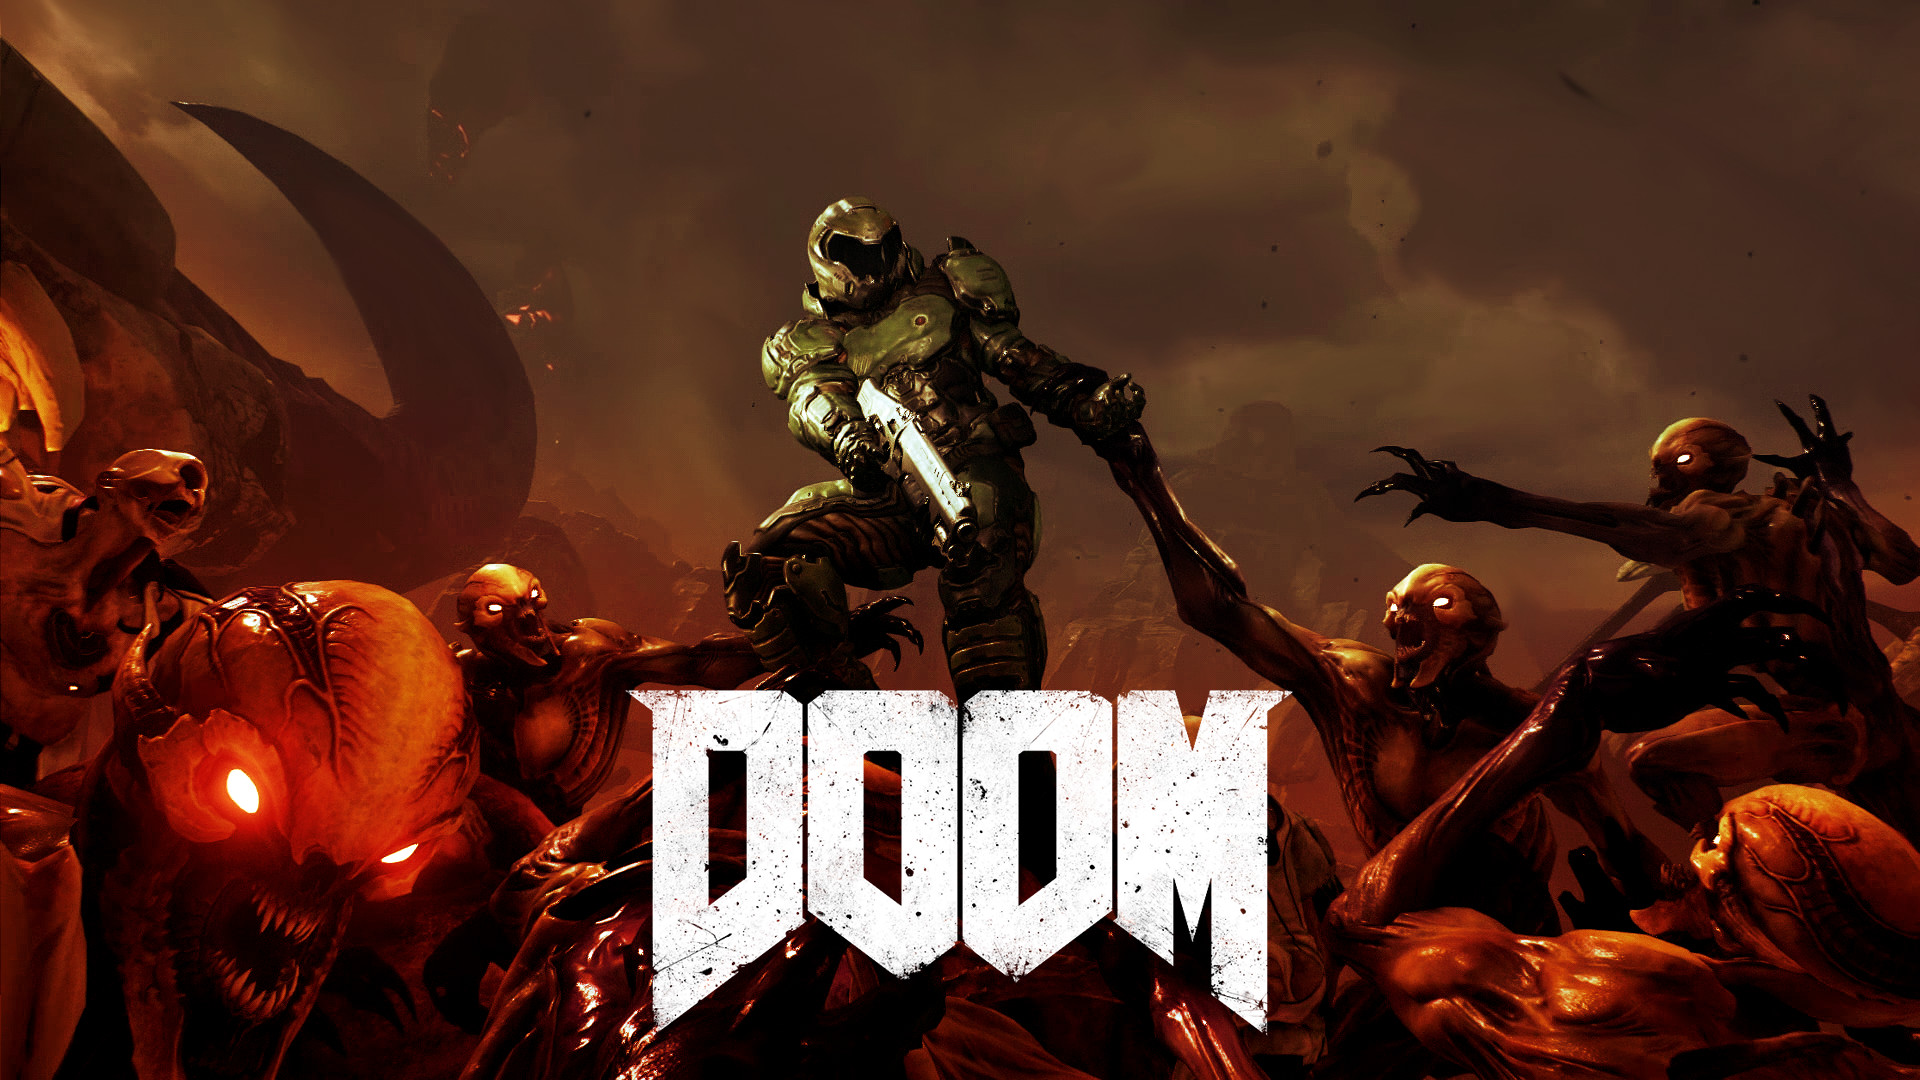 1920x1080 Dr Doom HD Wallpapers Desktop Backgrounds Mobile